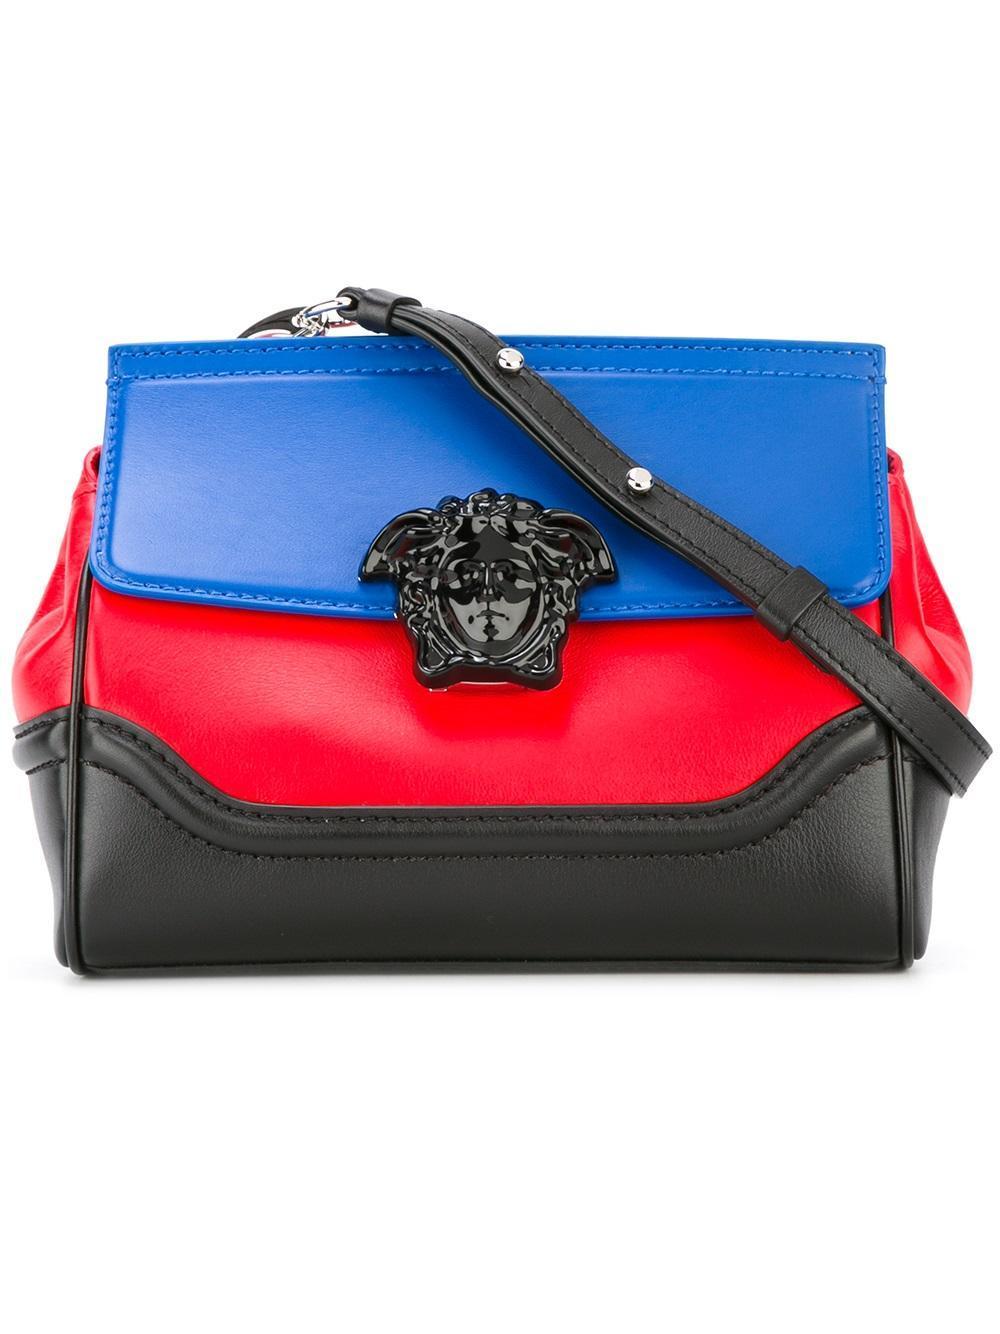 Lyst - Versace Palazzo Empire Colour Block Shoulder Bag in Black 5d8aee8d26490